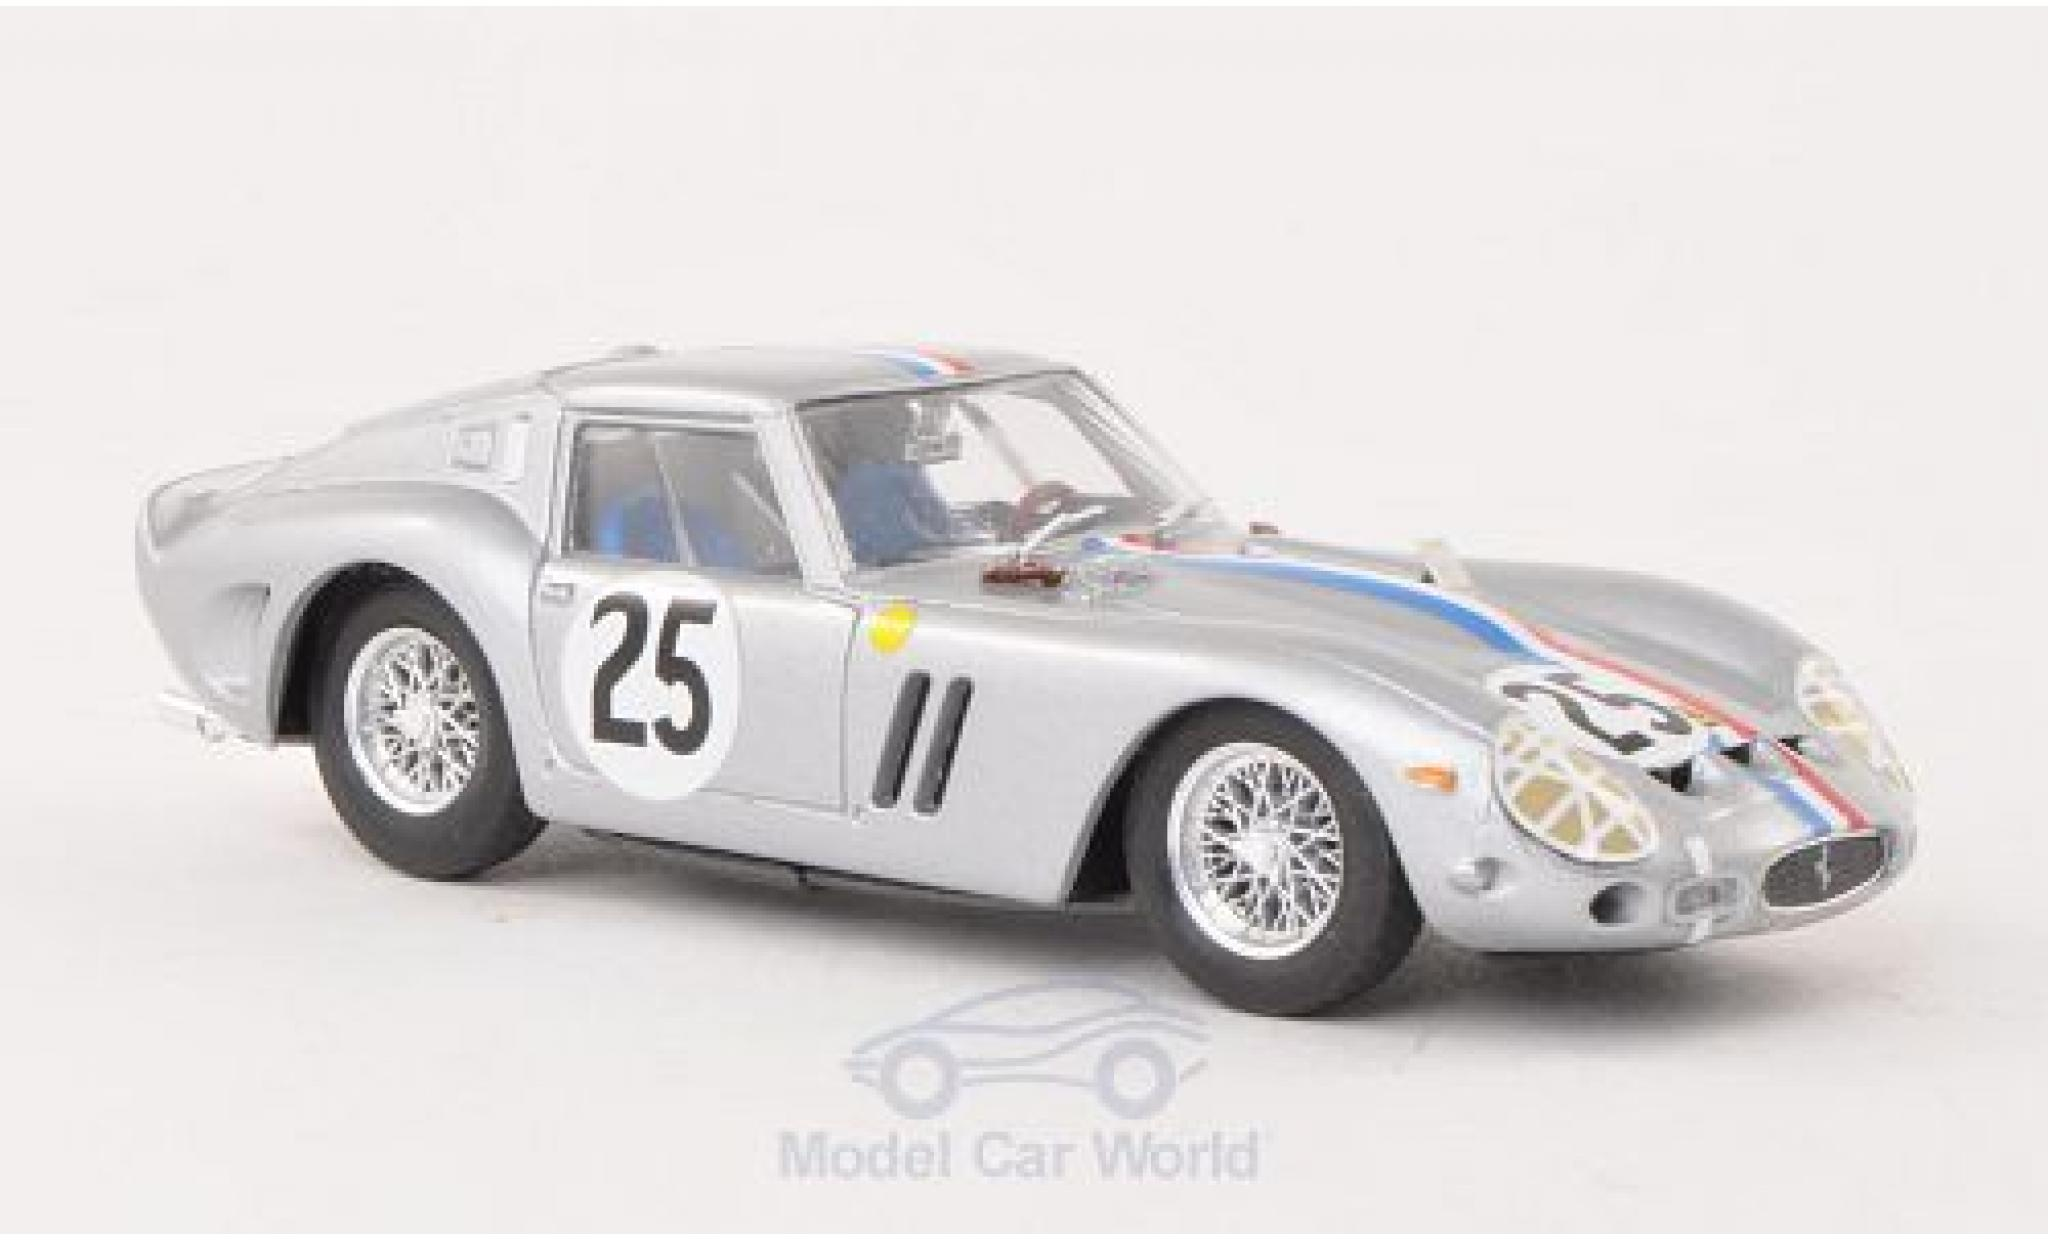 Ferrari 250 1/43 Brumm GTO No.25 National-Team Belgium 24h Le Mans 1963 Chassis 4153GT